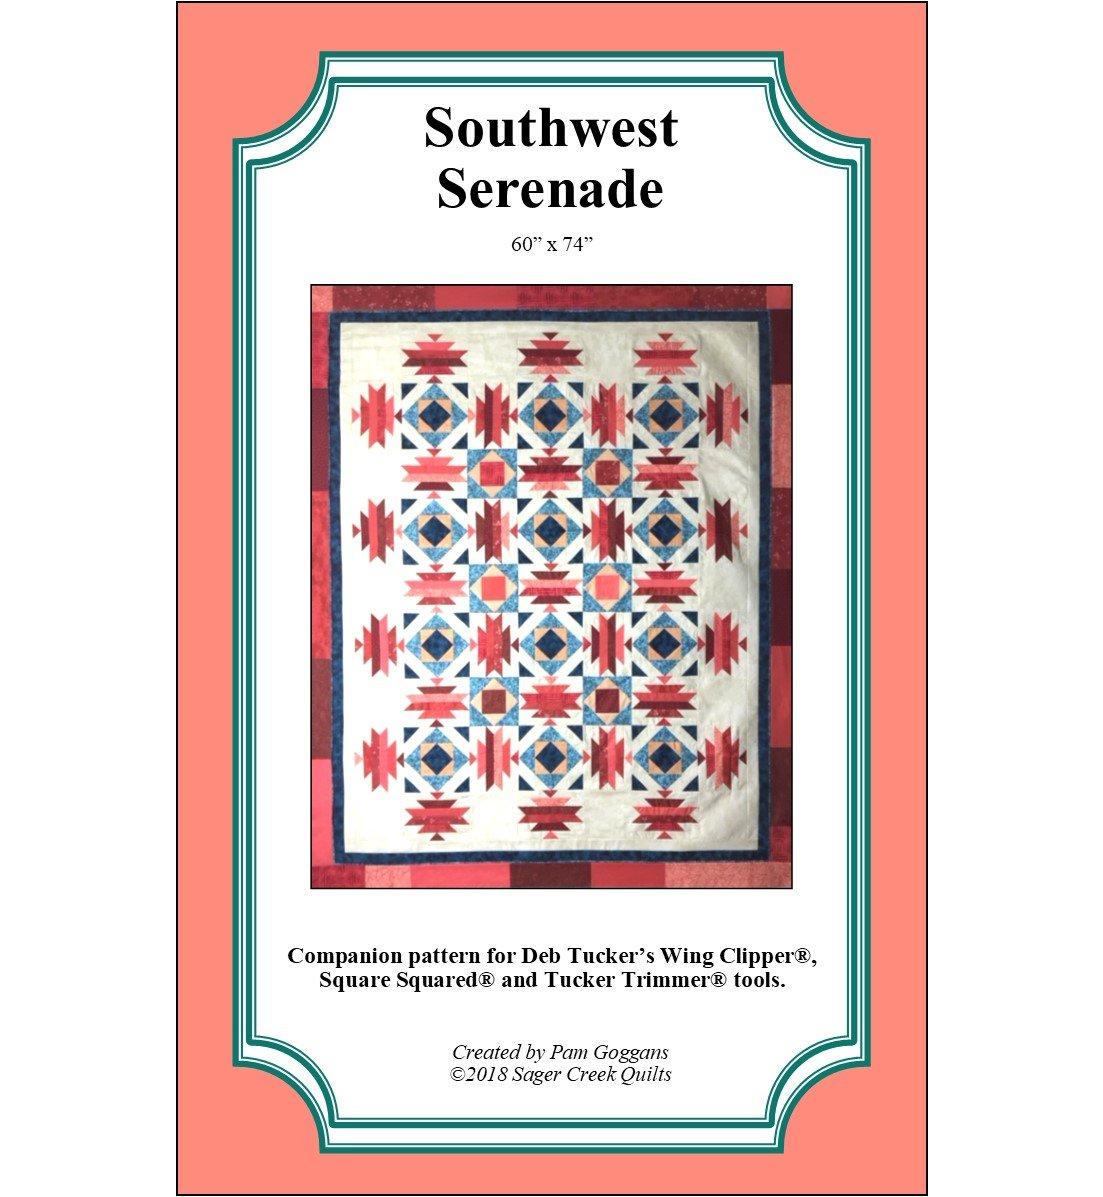 SCQ129 - Southwest Serenade